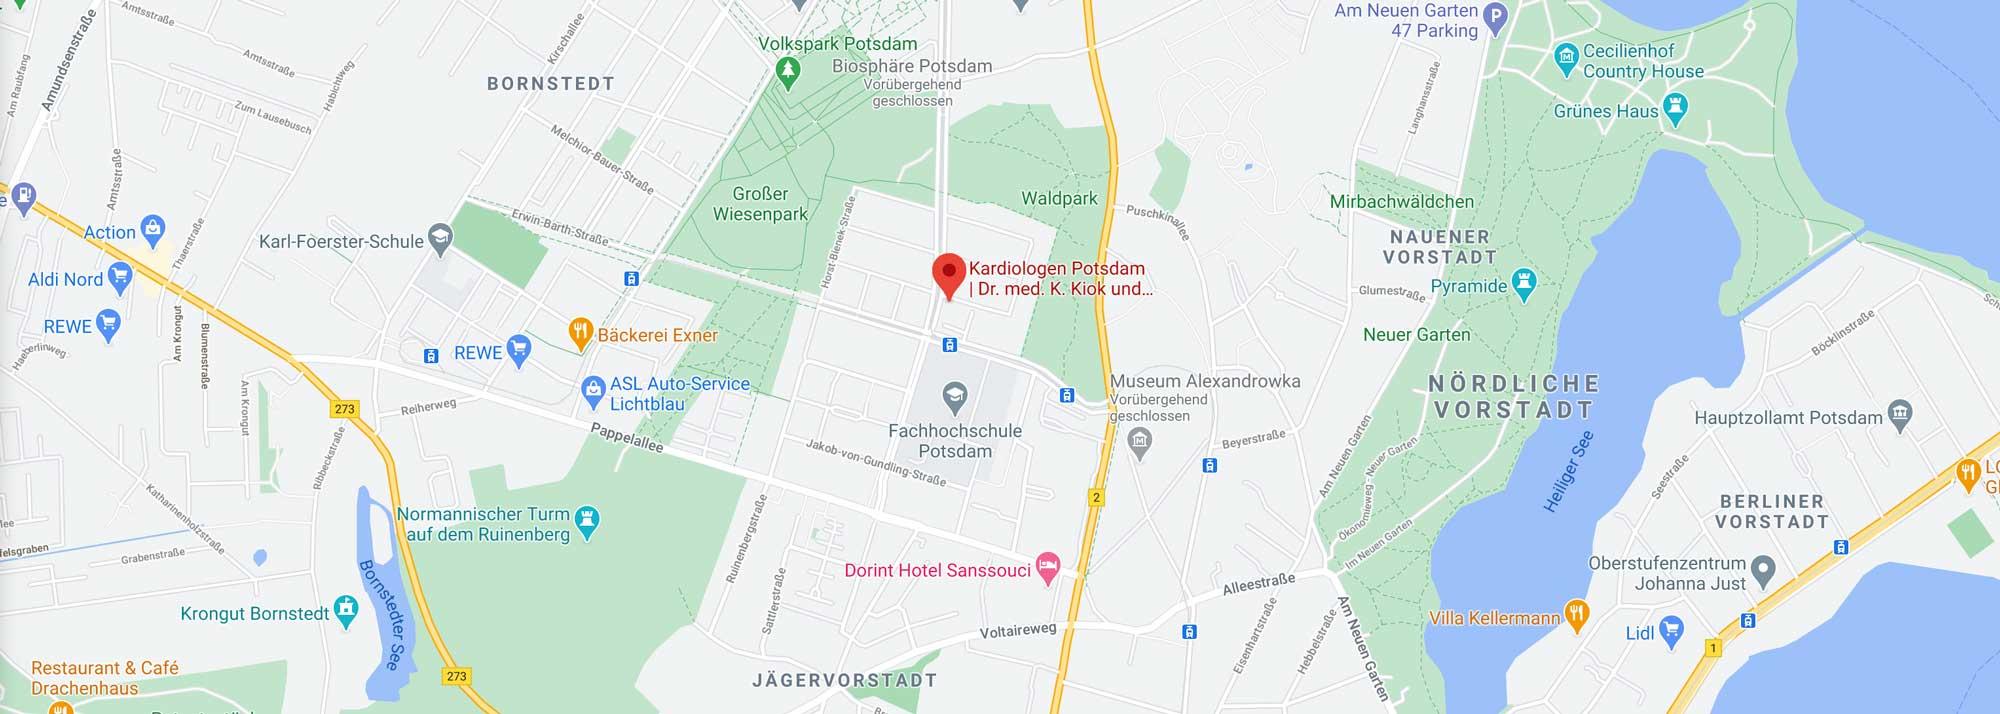 Kardiologen Potsdam Google Maps Anfahrt Praxisstandort